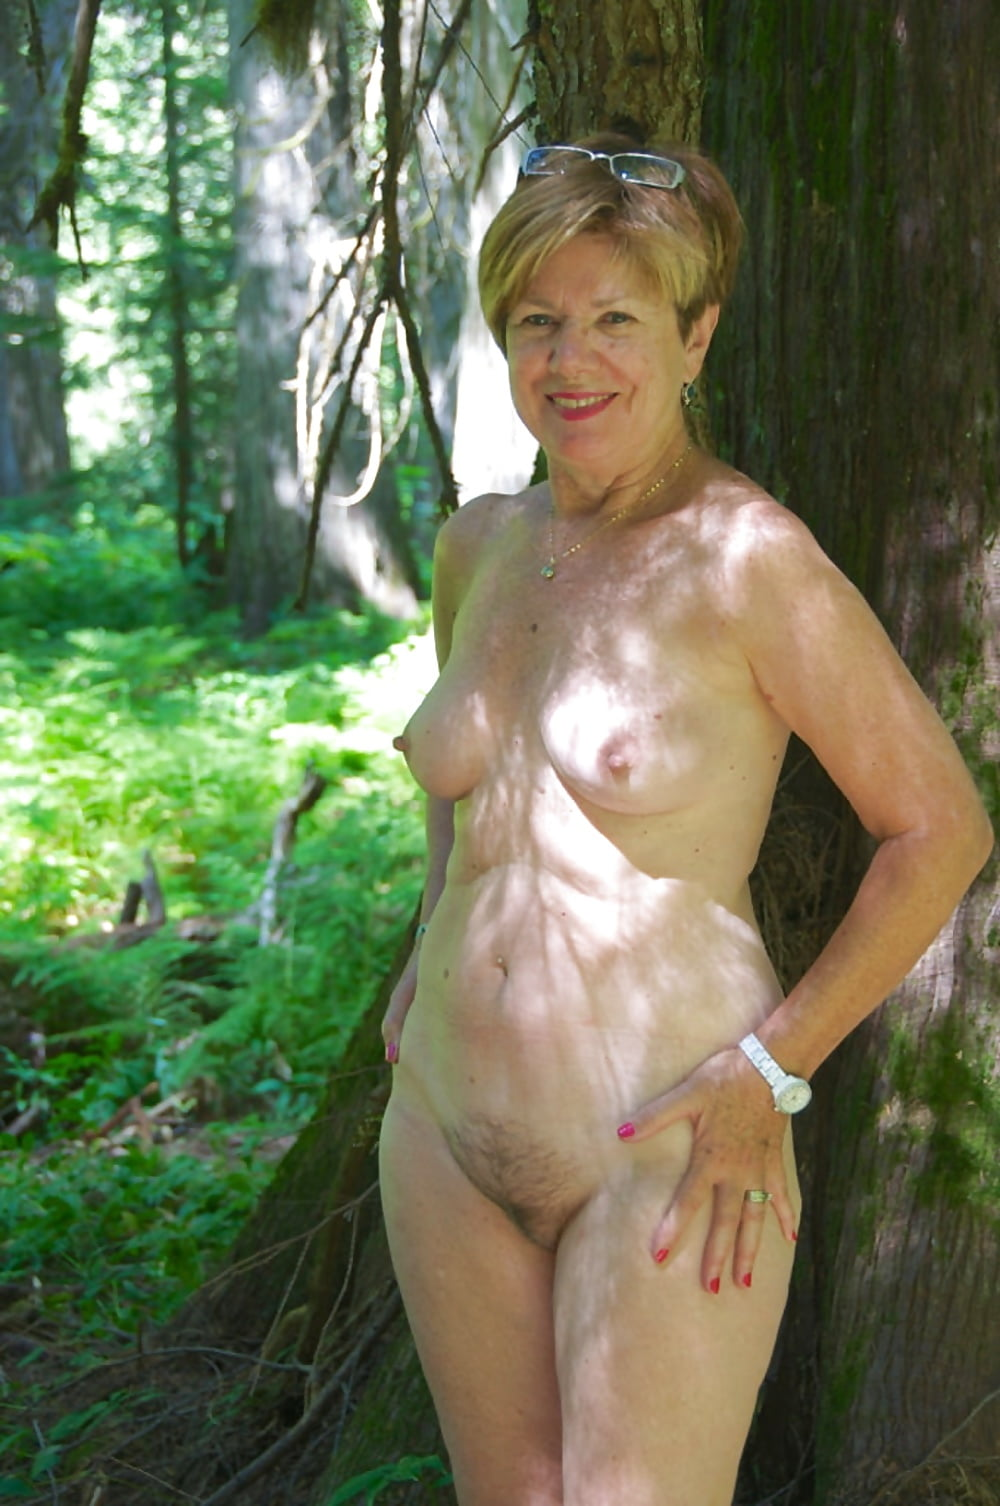 Hot nude mature and naked women photos